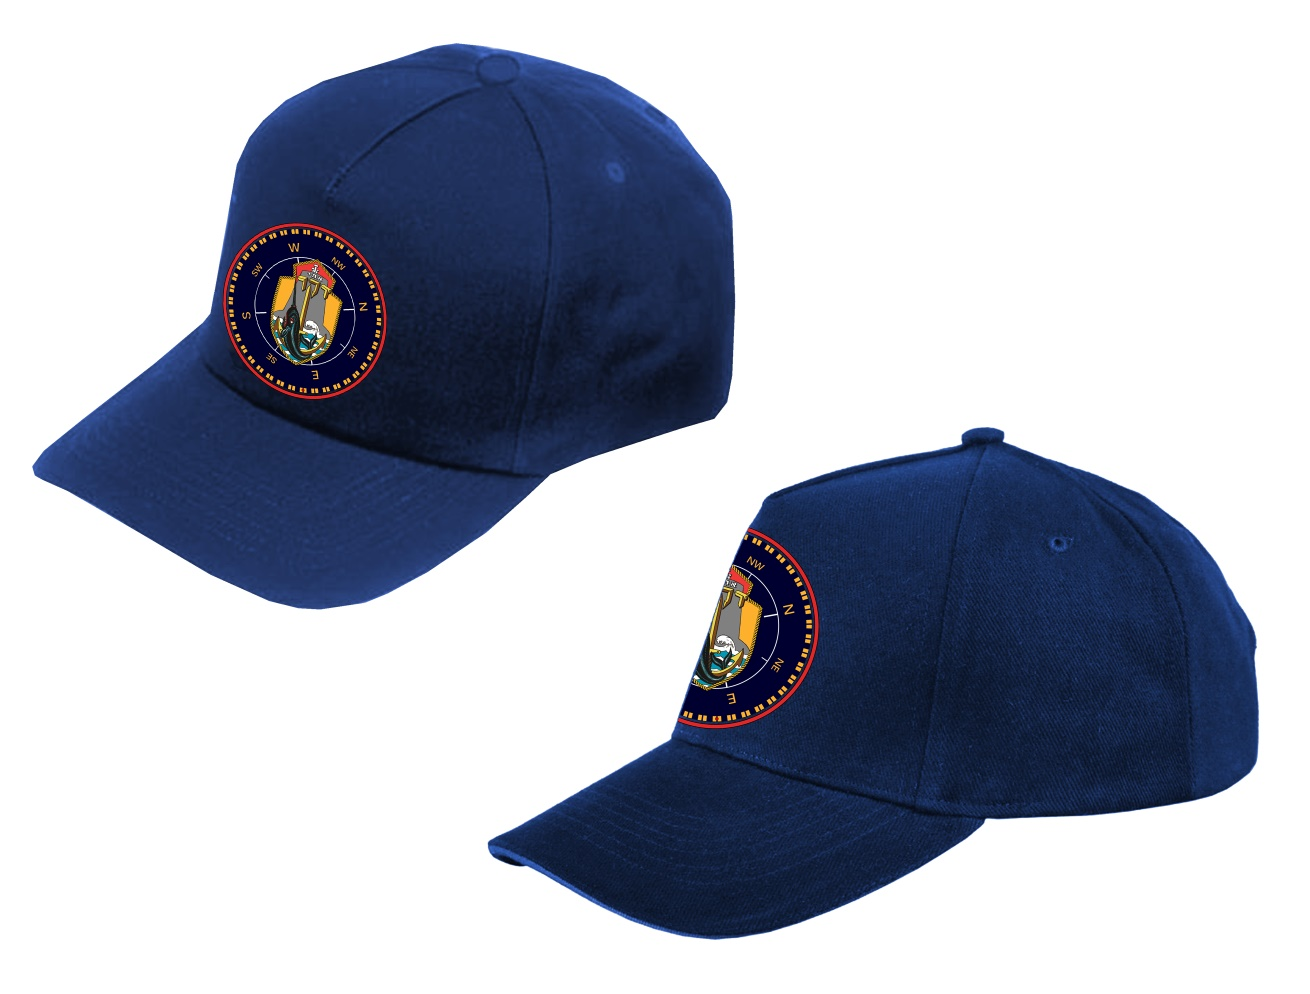 כובע עם הדפס